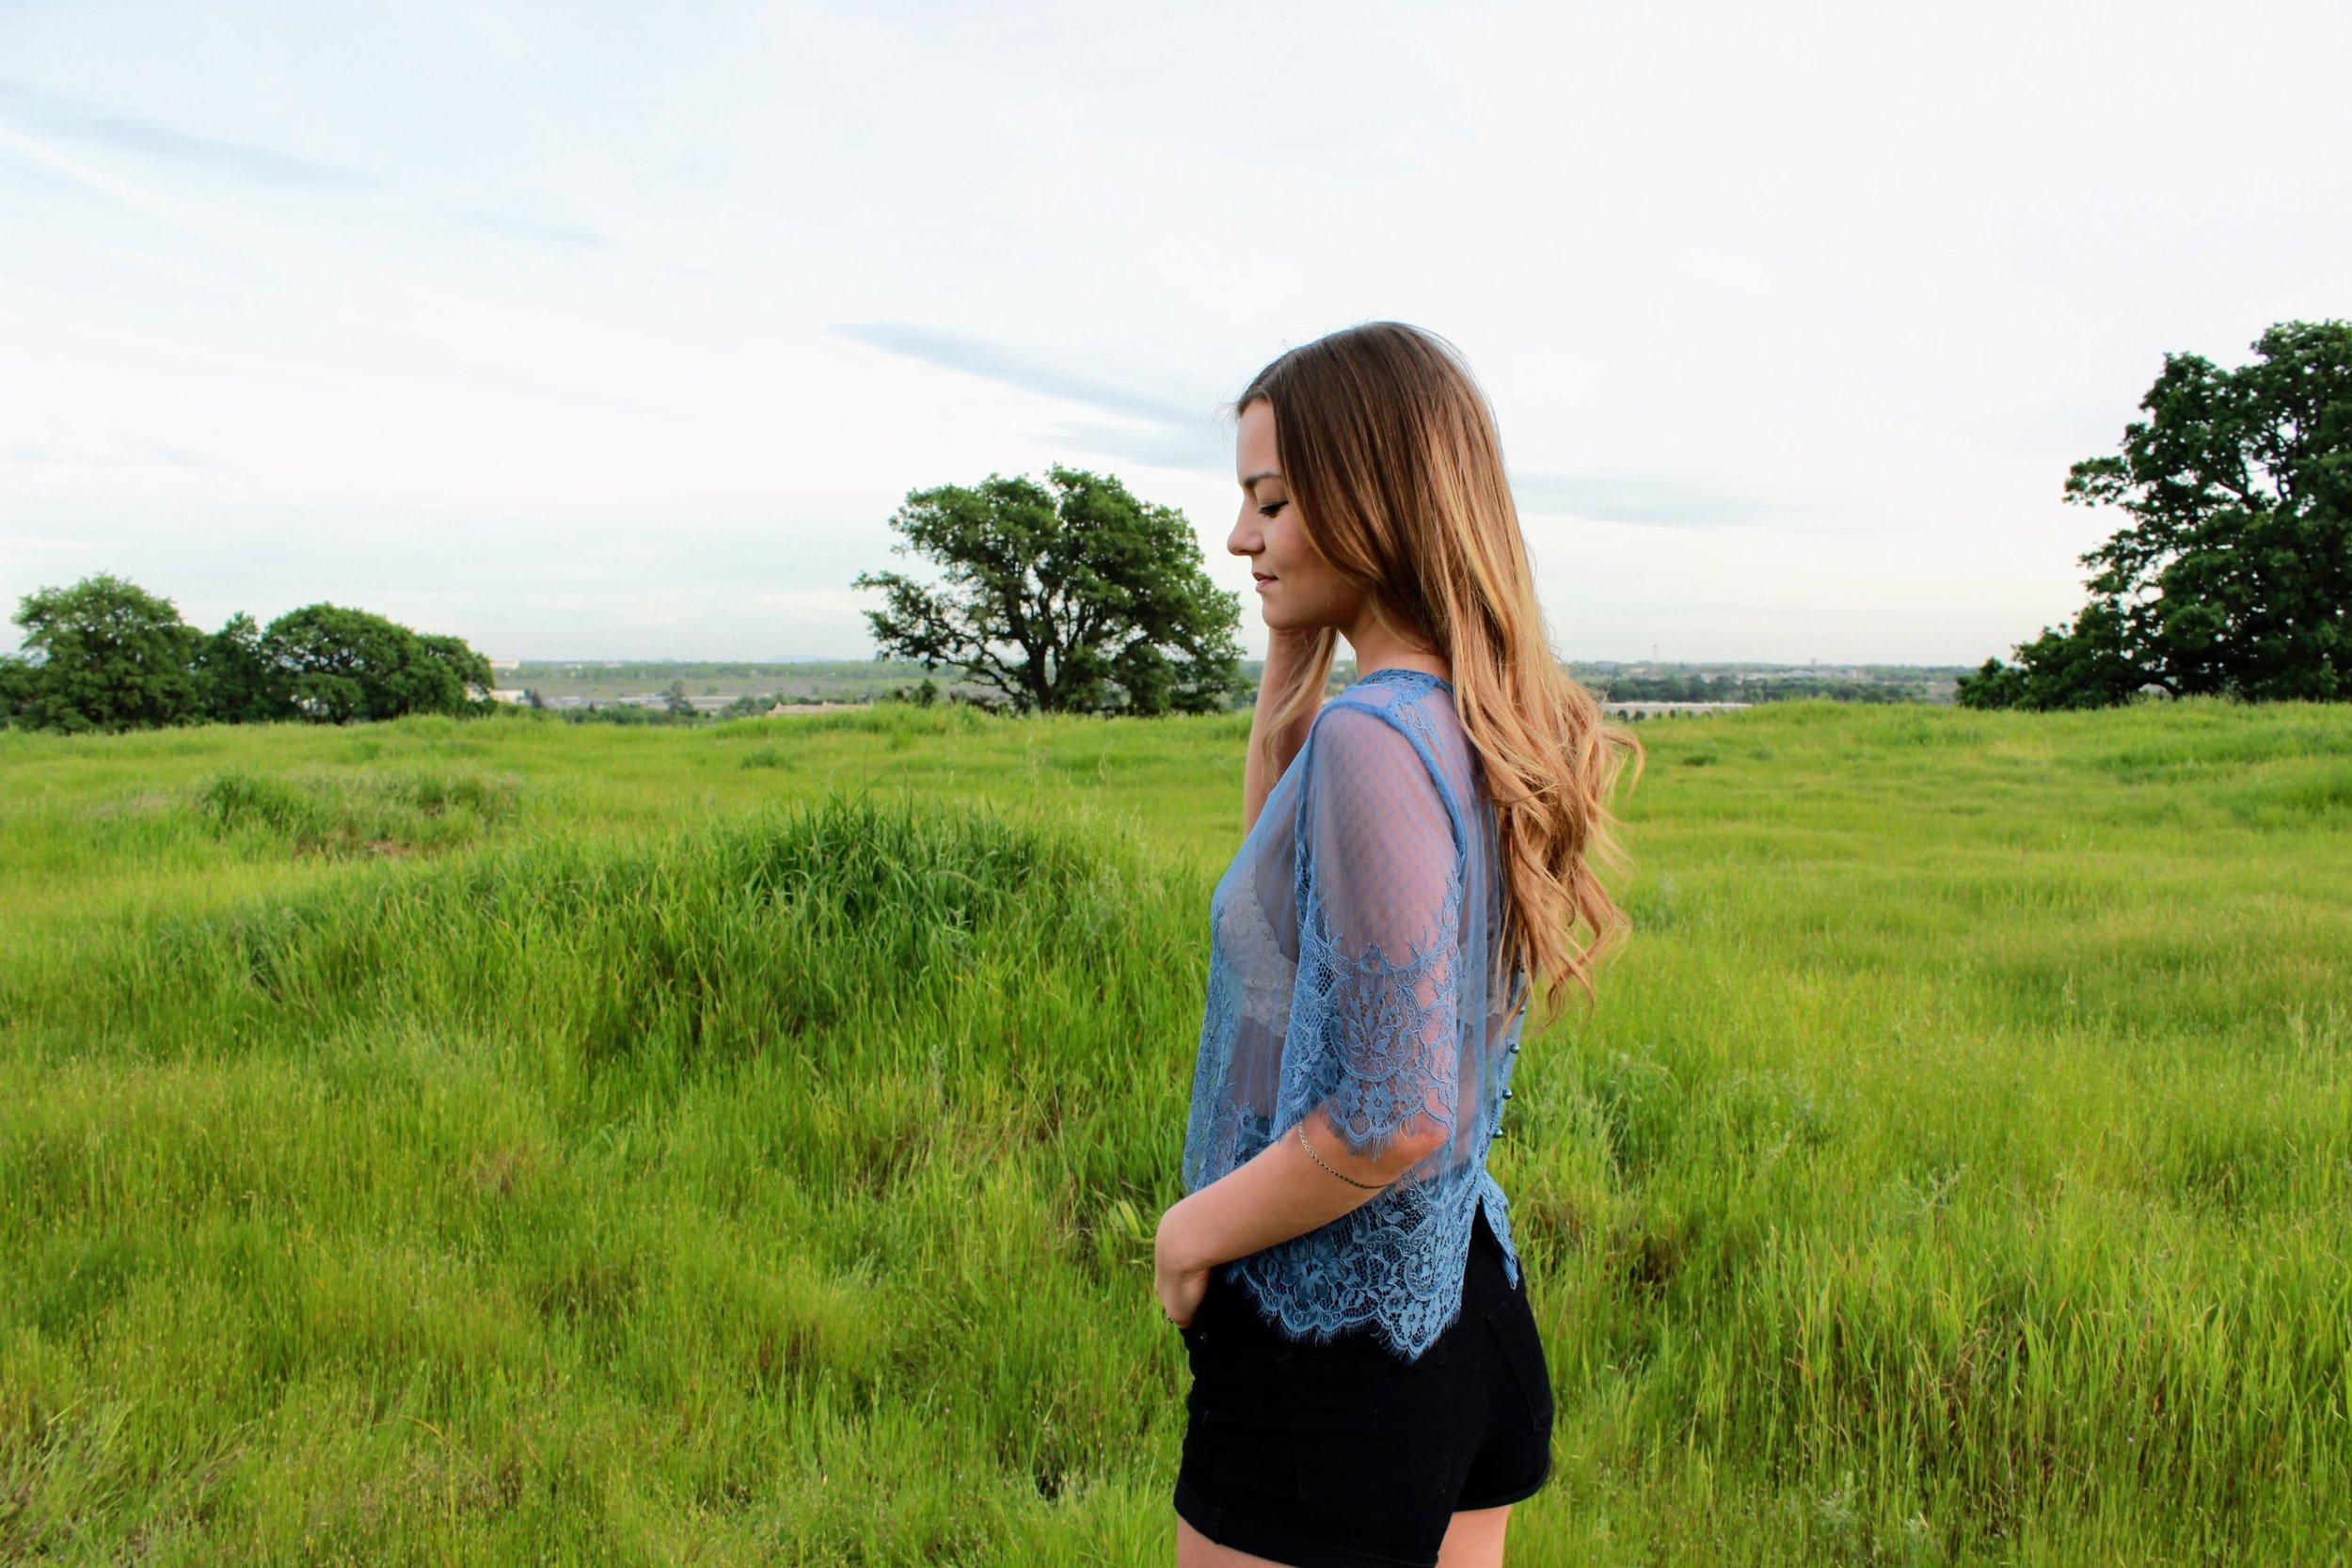 Lace Blue Top from H&M x Coachella collaboration. Festive Fashion